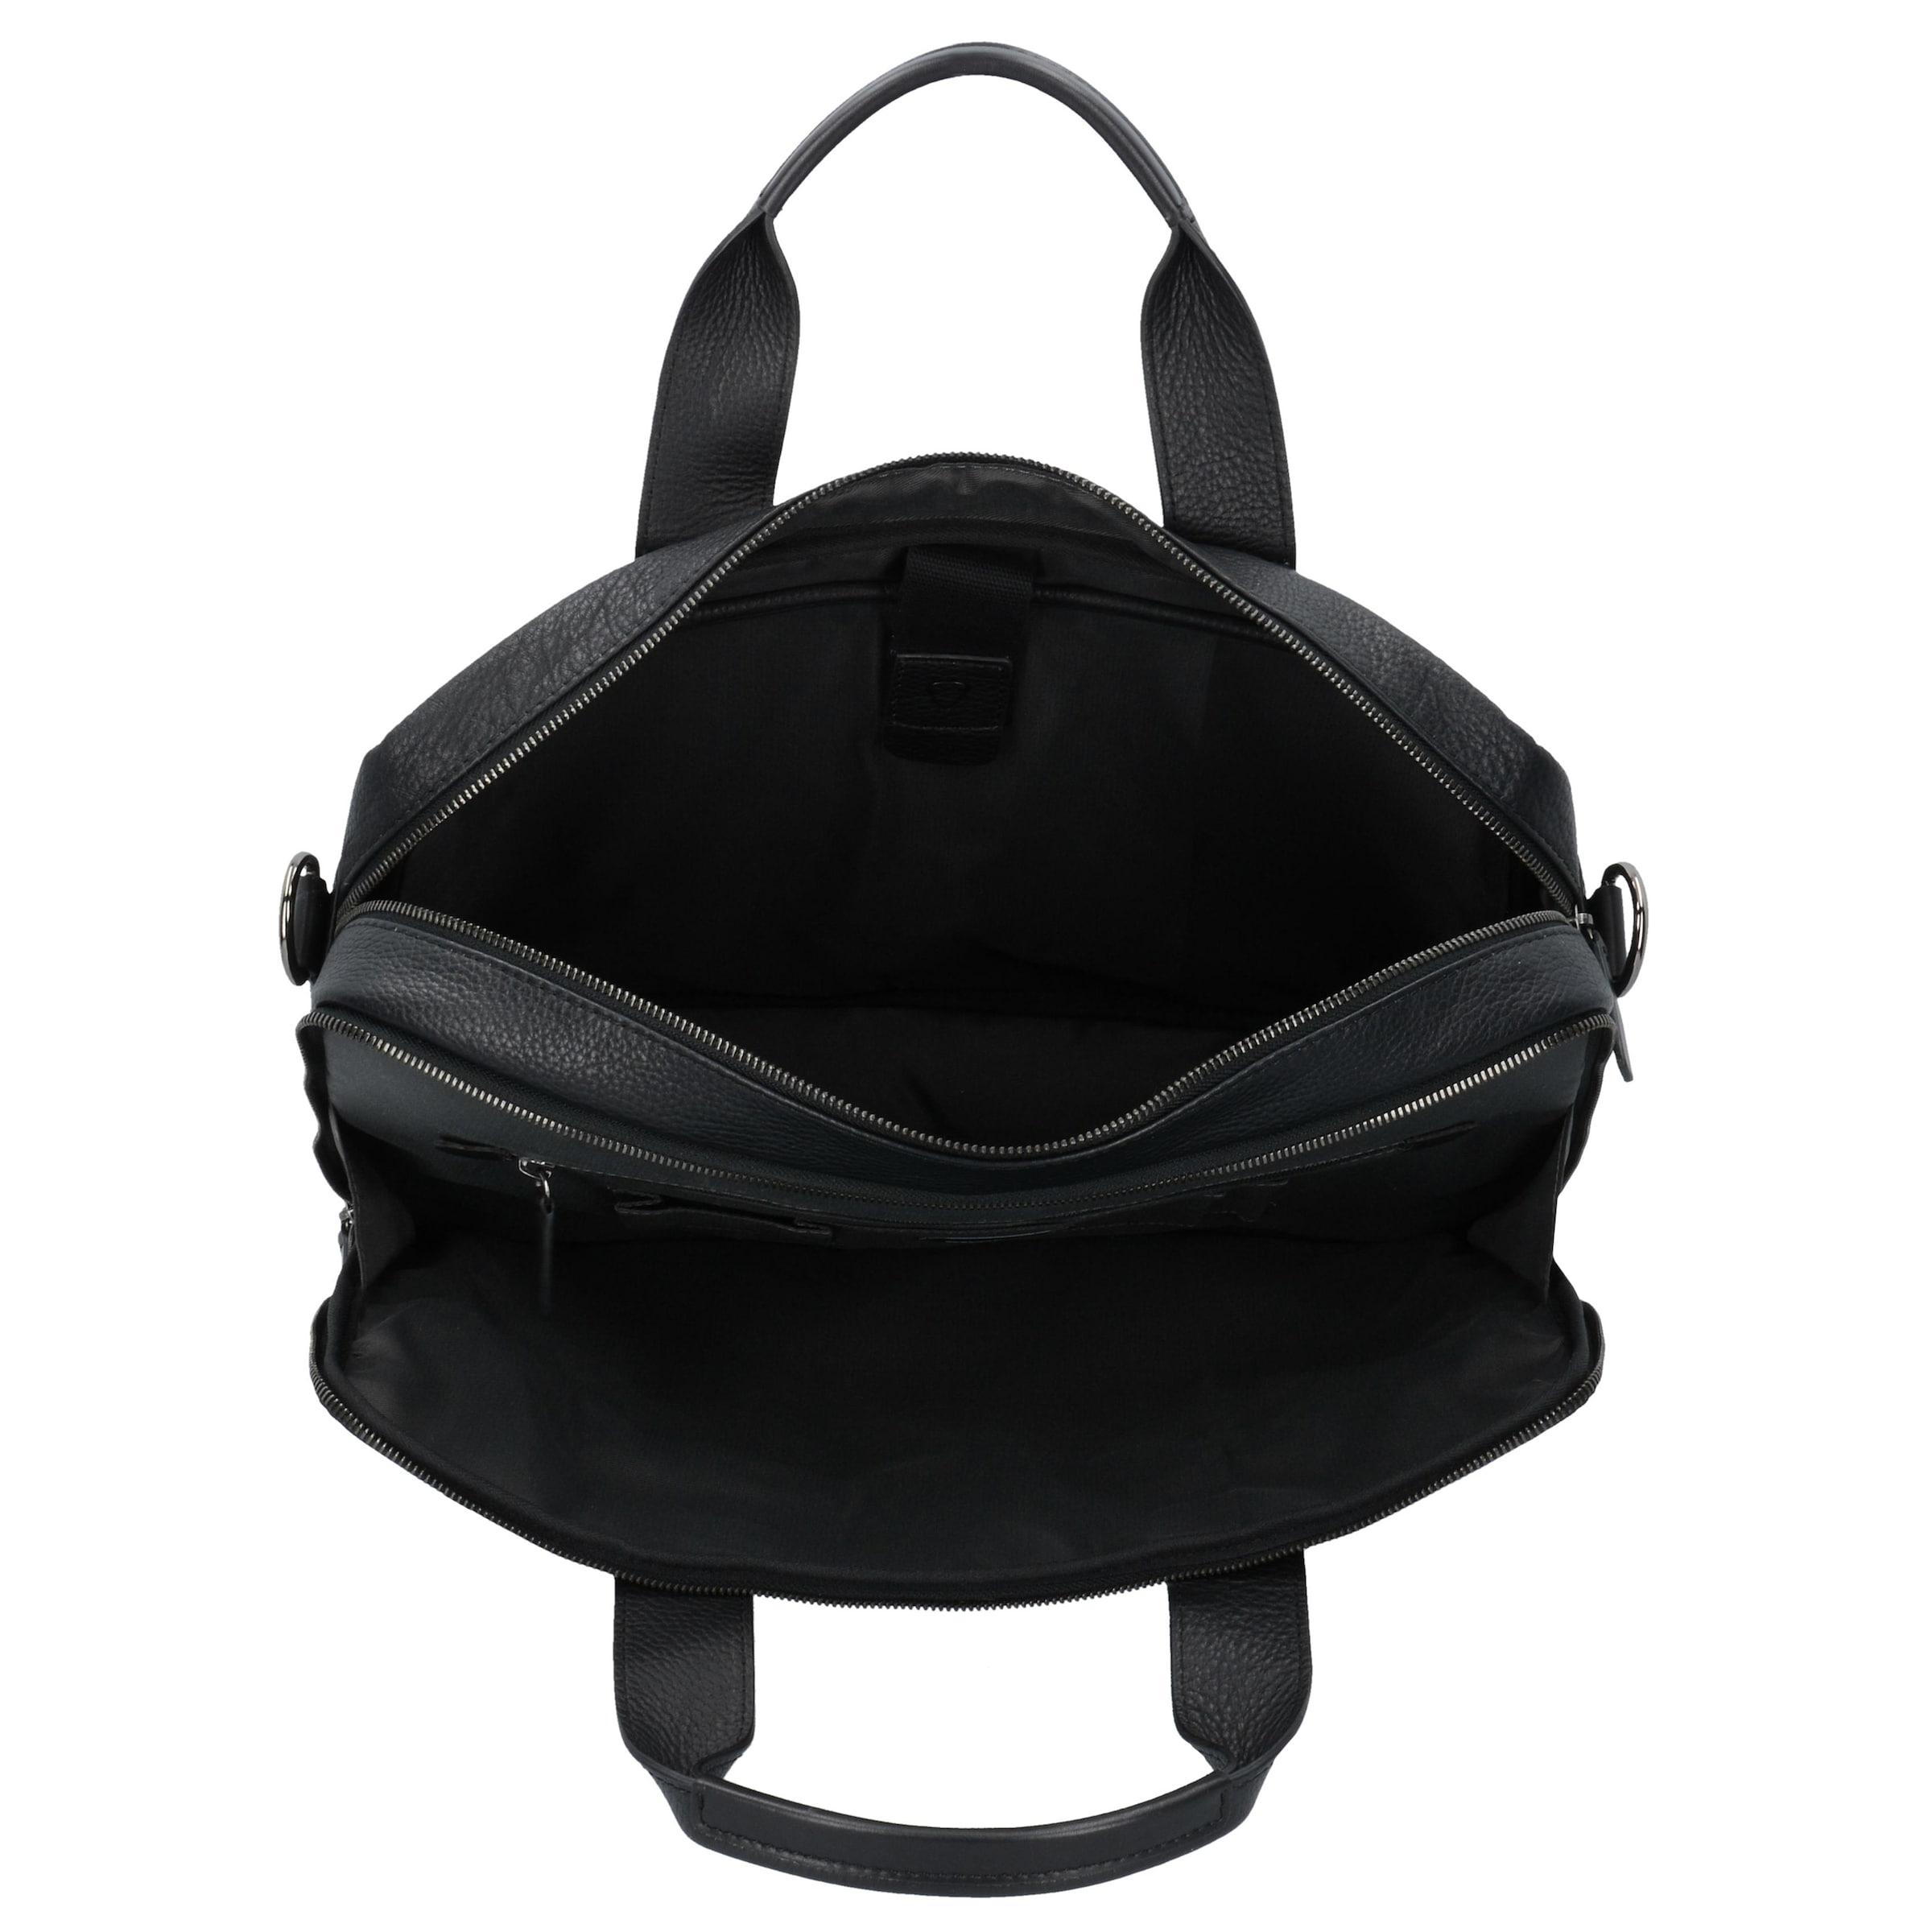 Schwarz Aktentasche 40 Cm In Garret Strellson Leder Laptopfach H2E9DI